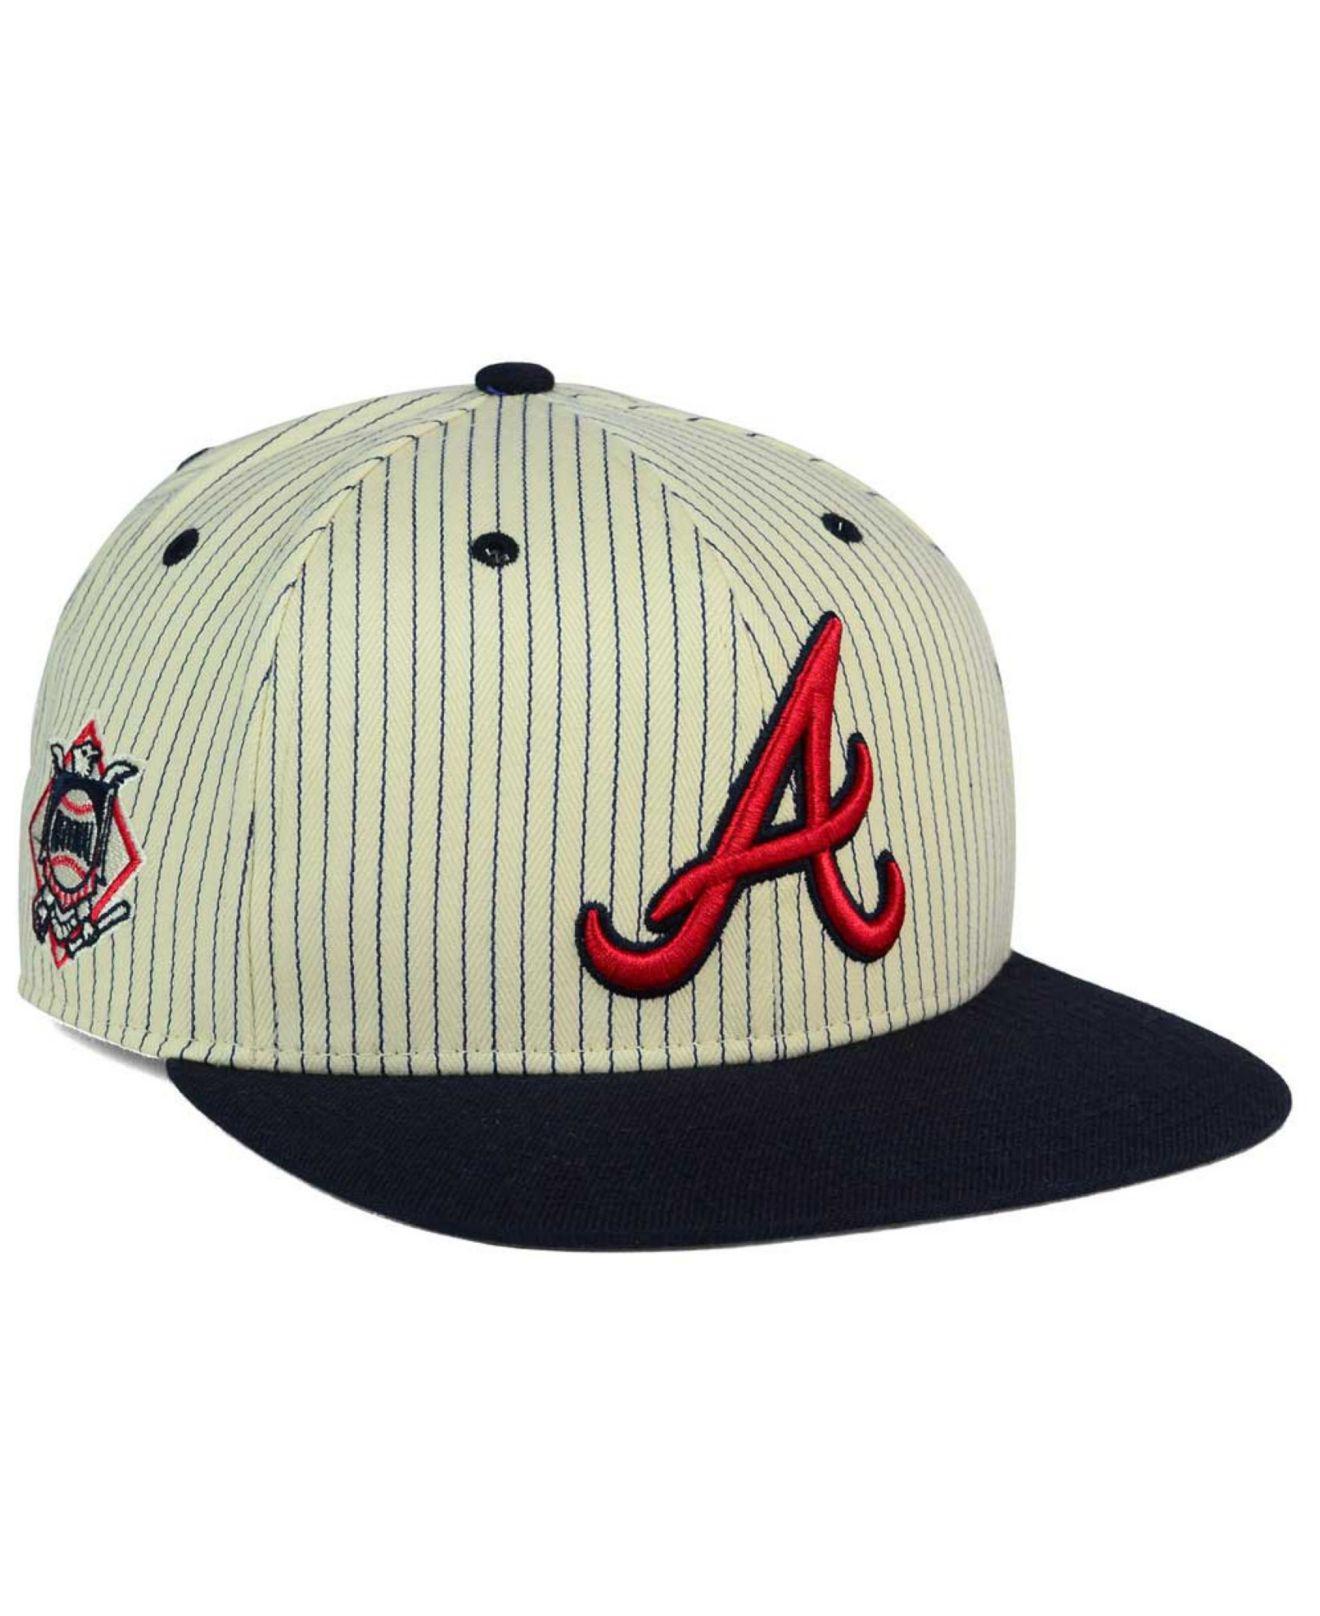 63b10b7f48a Lyst - 47 Brand Atlanta Braves Woodside Captain Snapback Cap in ...